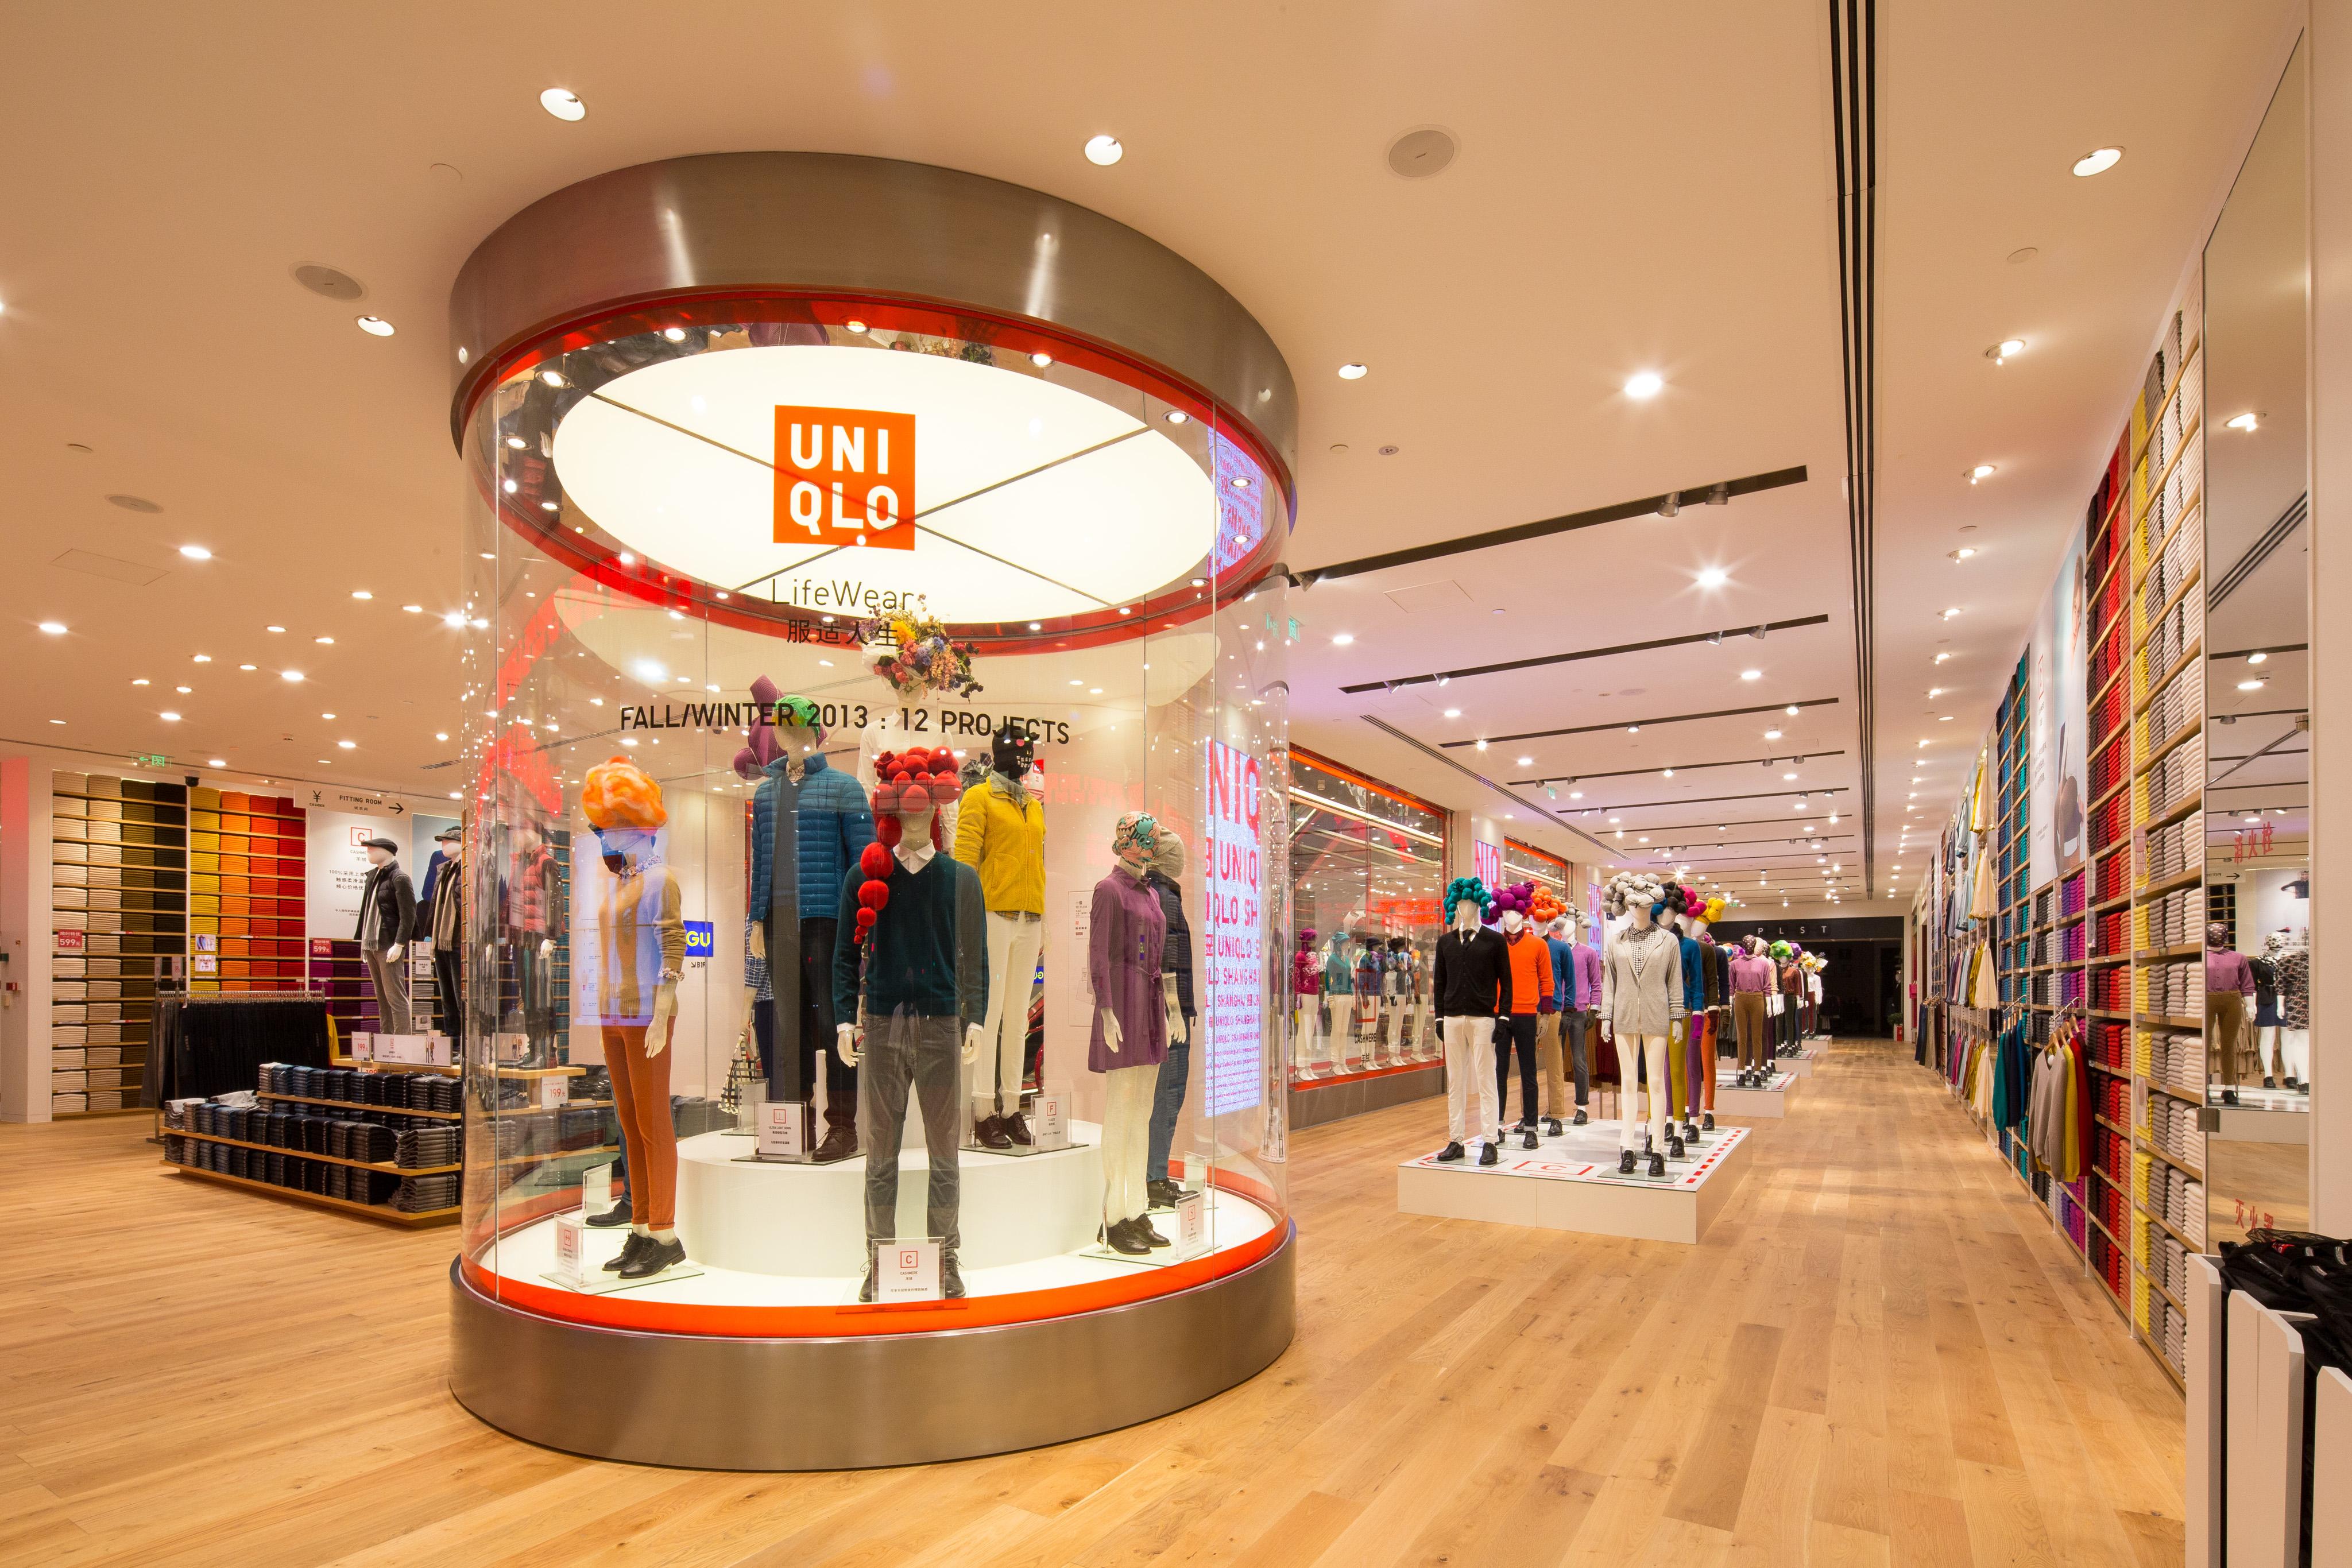 Home Design Company In Thailand Uniqlo International Fast Retailing Co Ltd